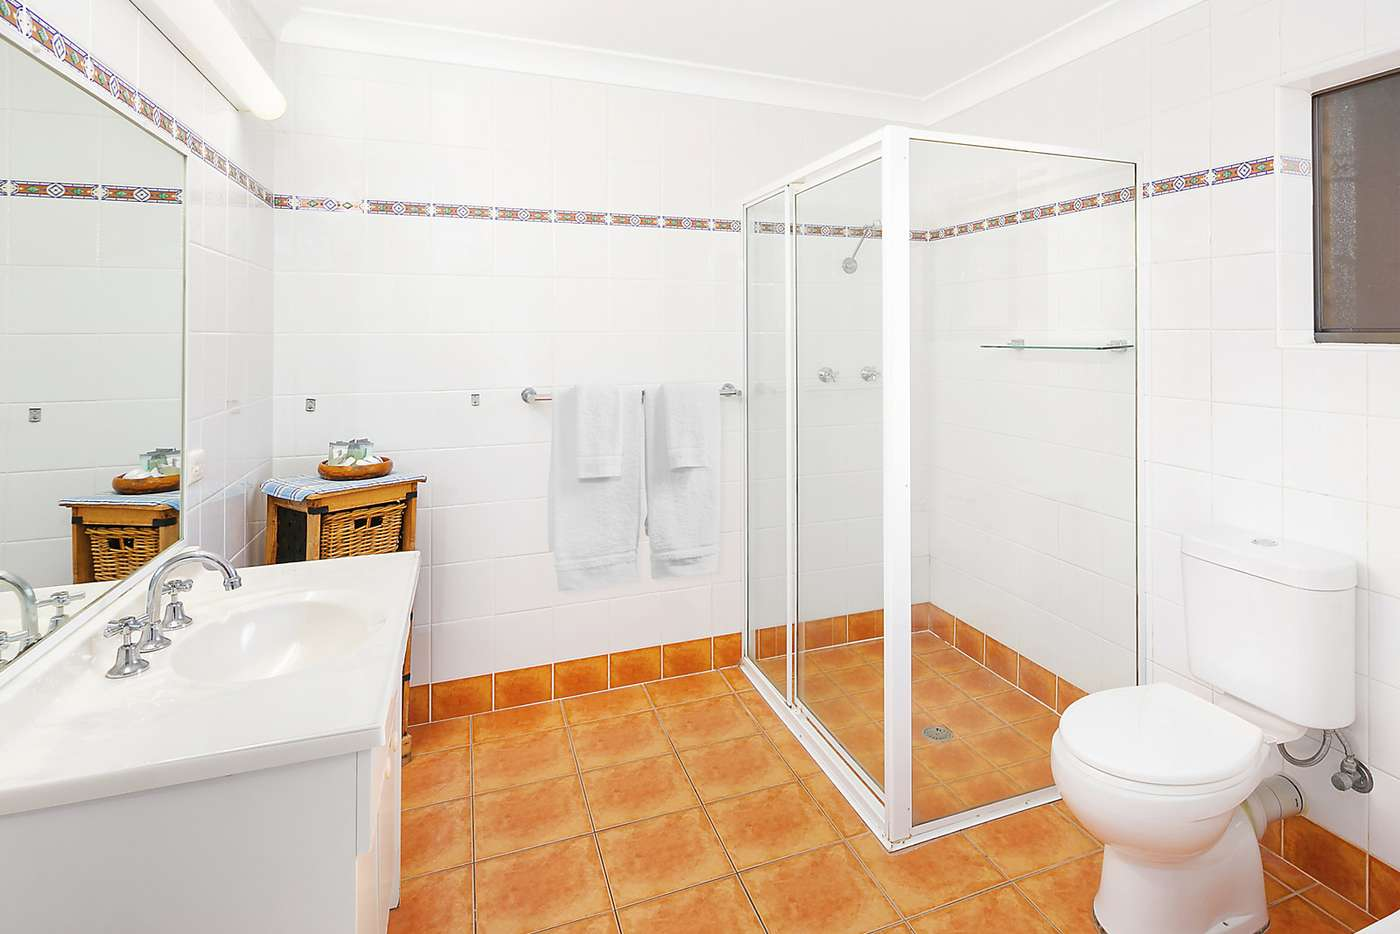 Sixth view of Homely unit listing, 9/61 Boronia Street, Sawtell NSW 2452